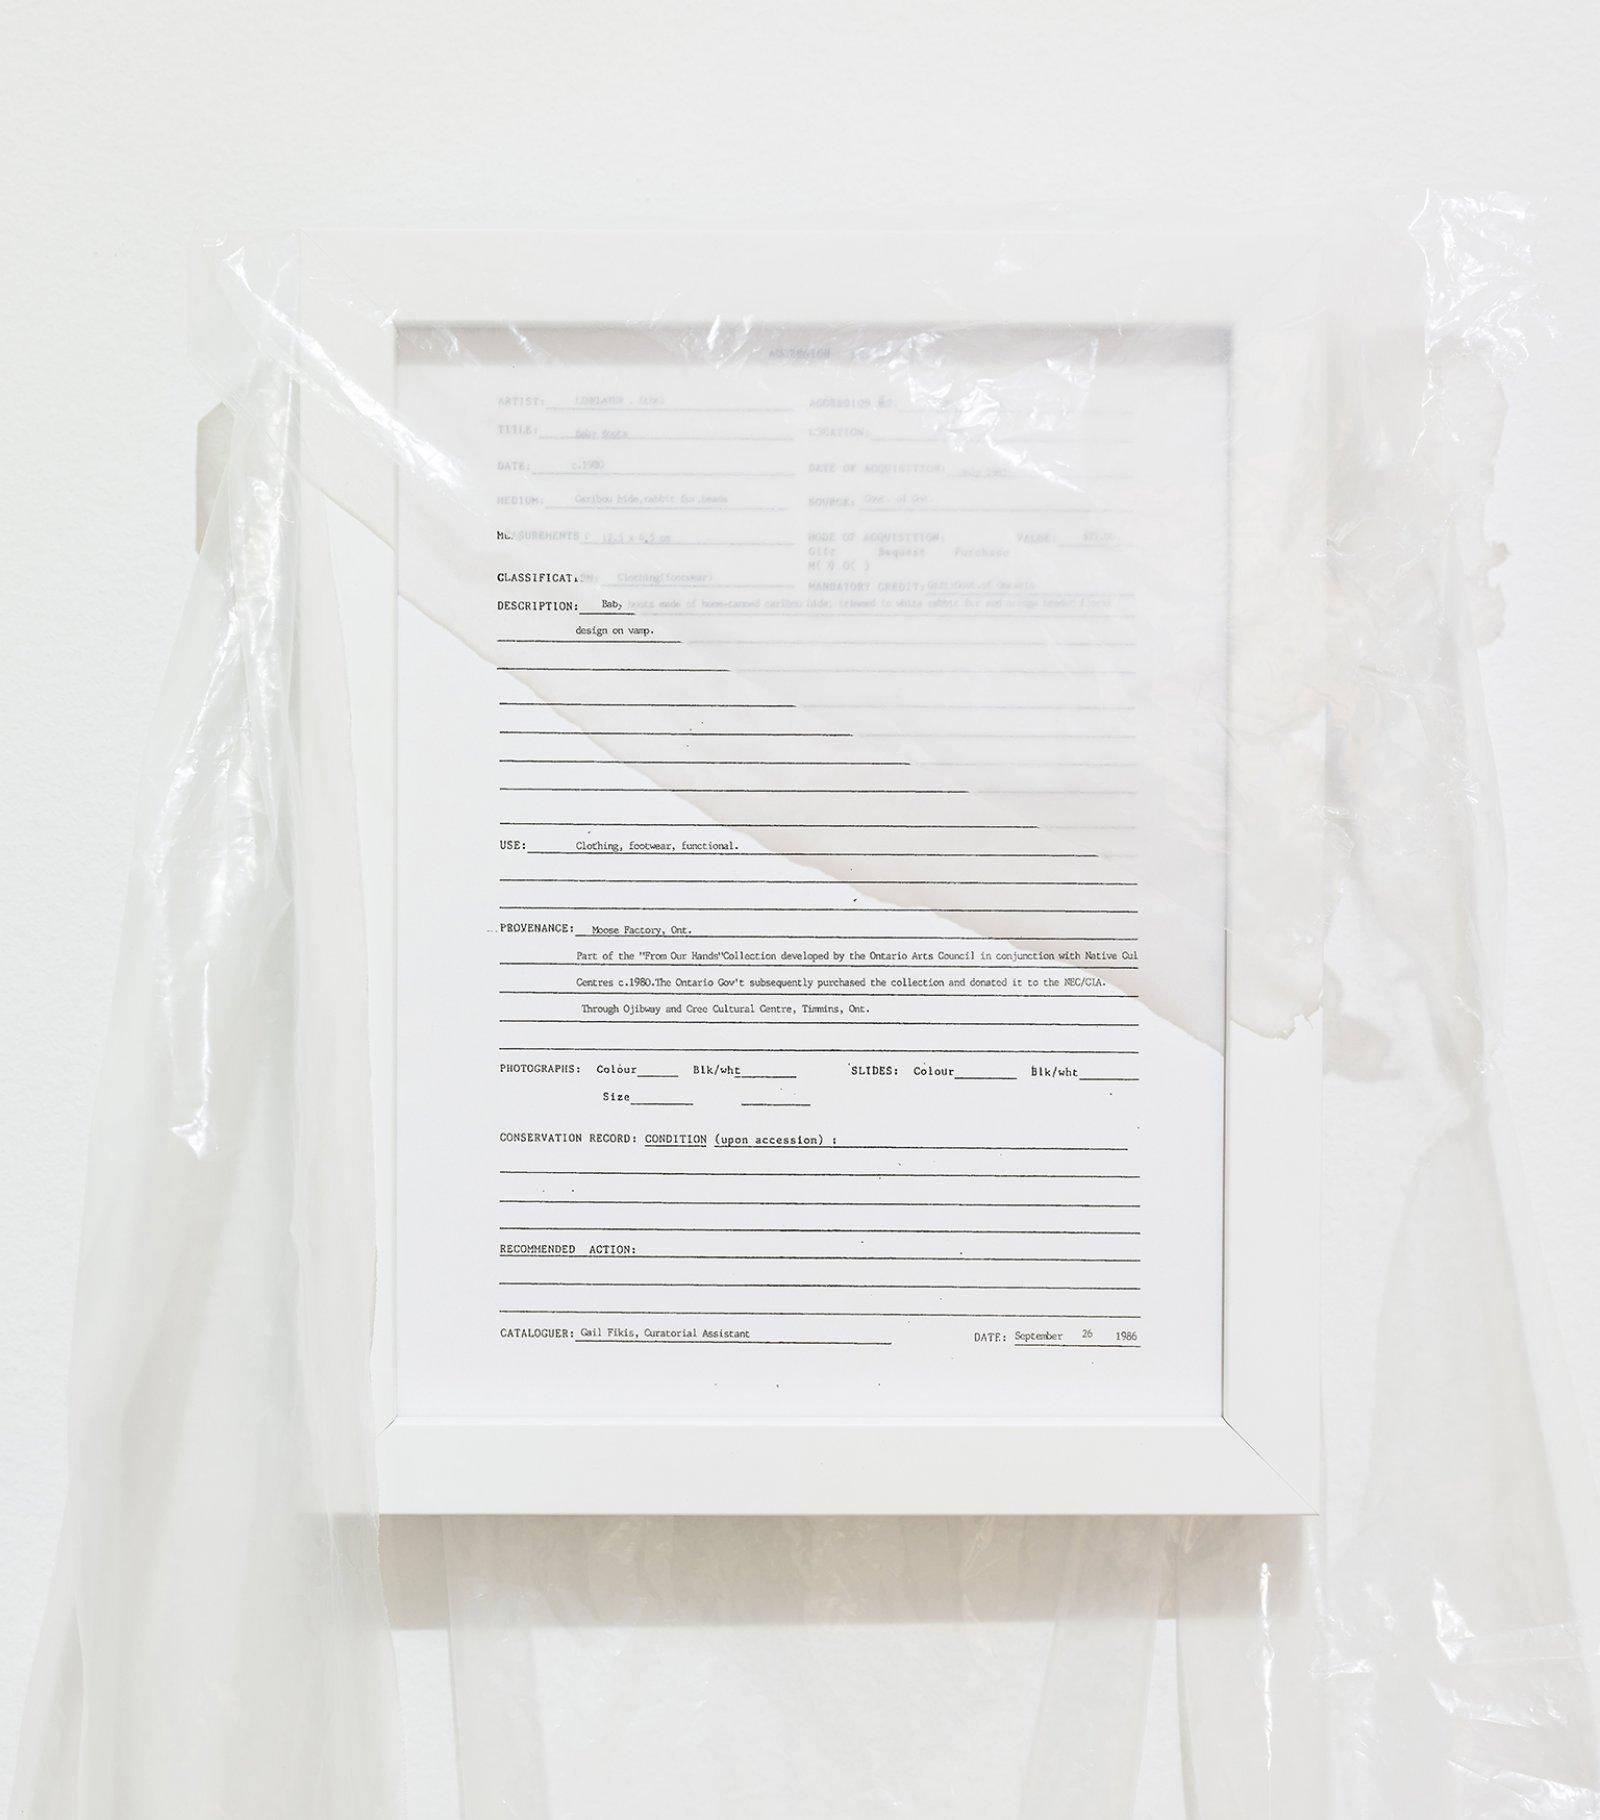 Duane Linklater, Accession, 2016, framed digital print, plastic, 10 x 12 in. (25 x 31 cm) by Duane Linklater